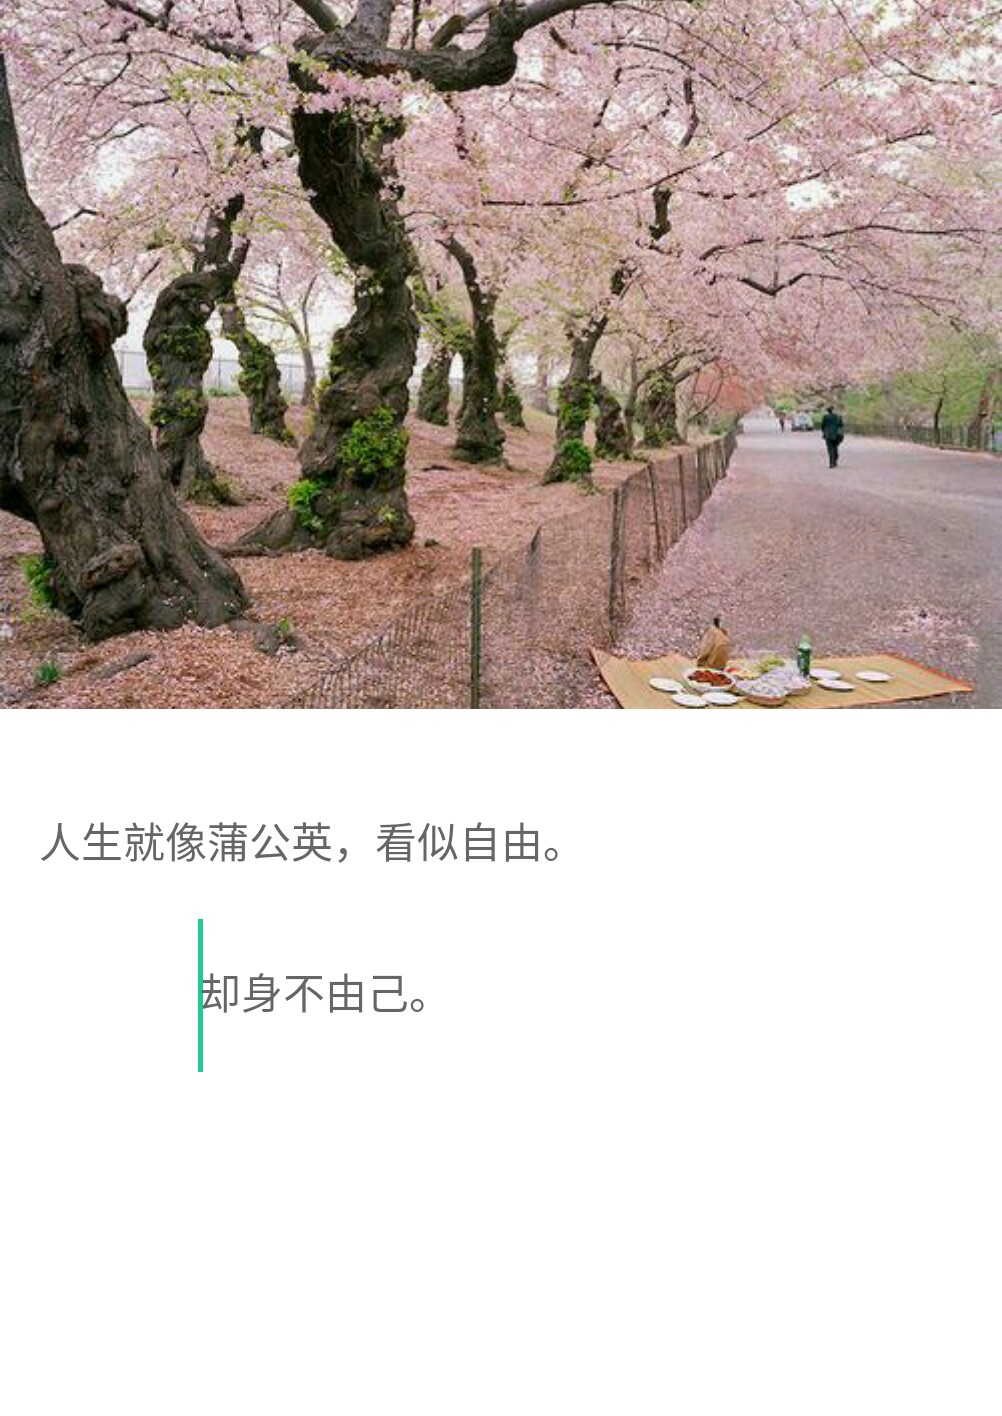 http://www.58100.com/pid/610284.html